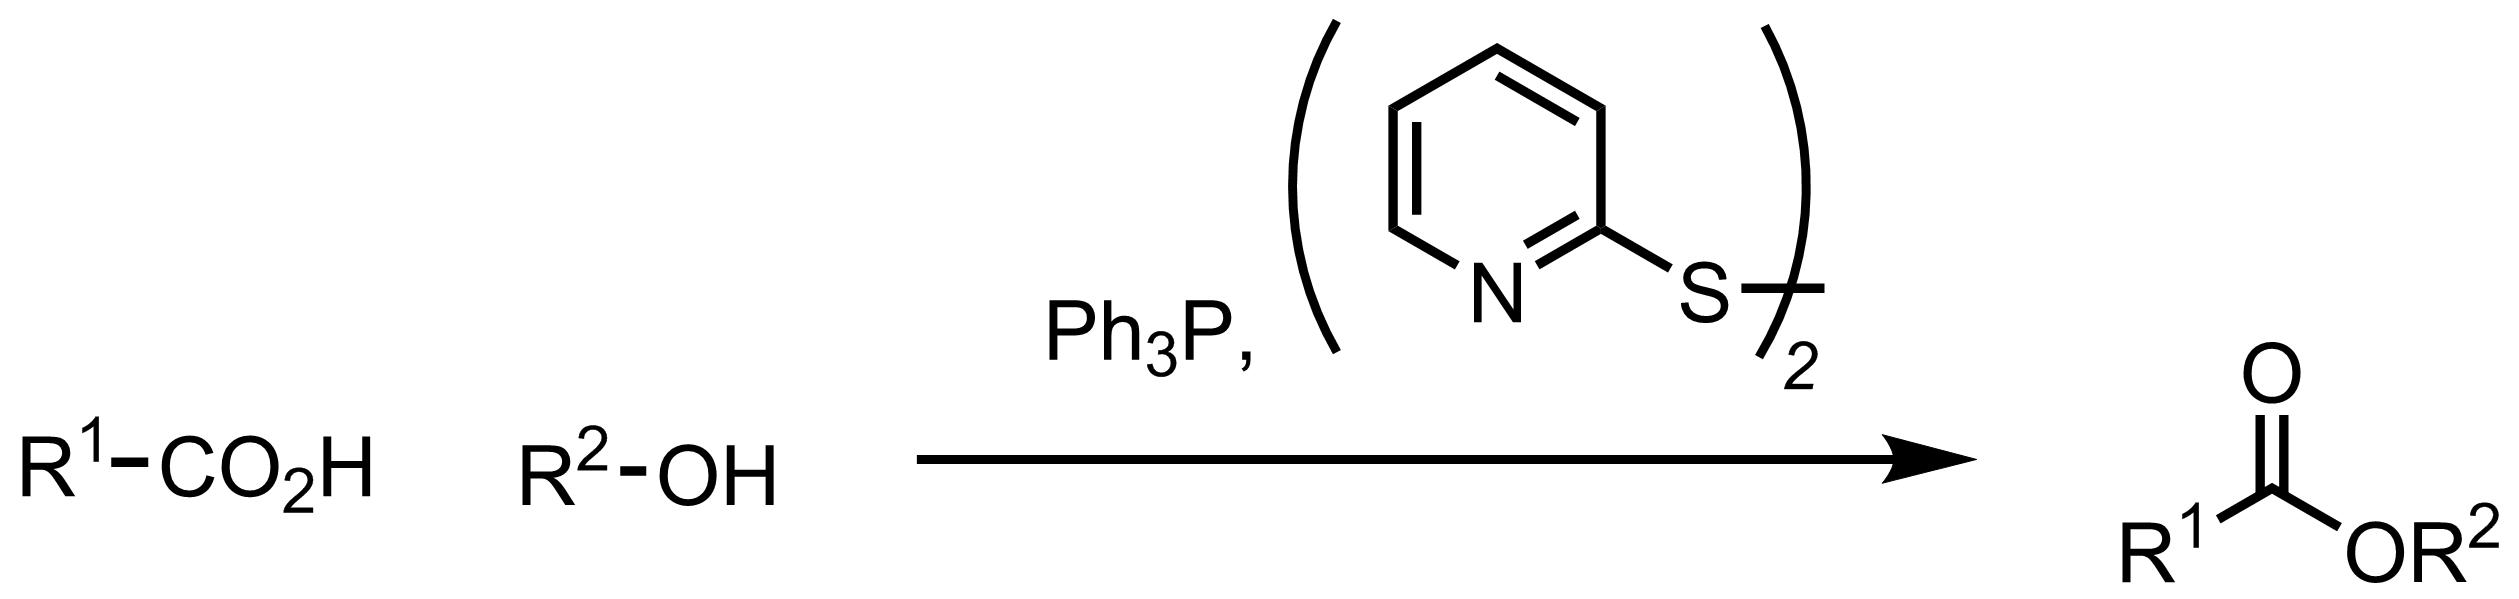 Schematic representation of the Corey-Nicolaou Macrolactonization.